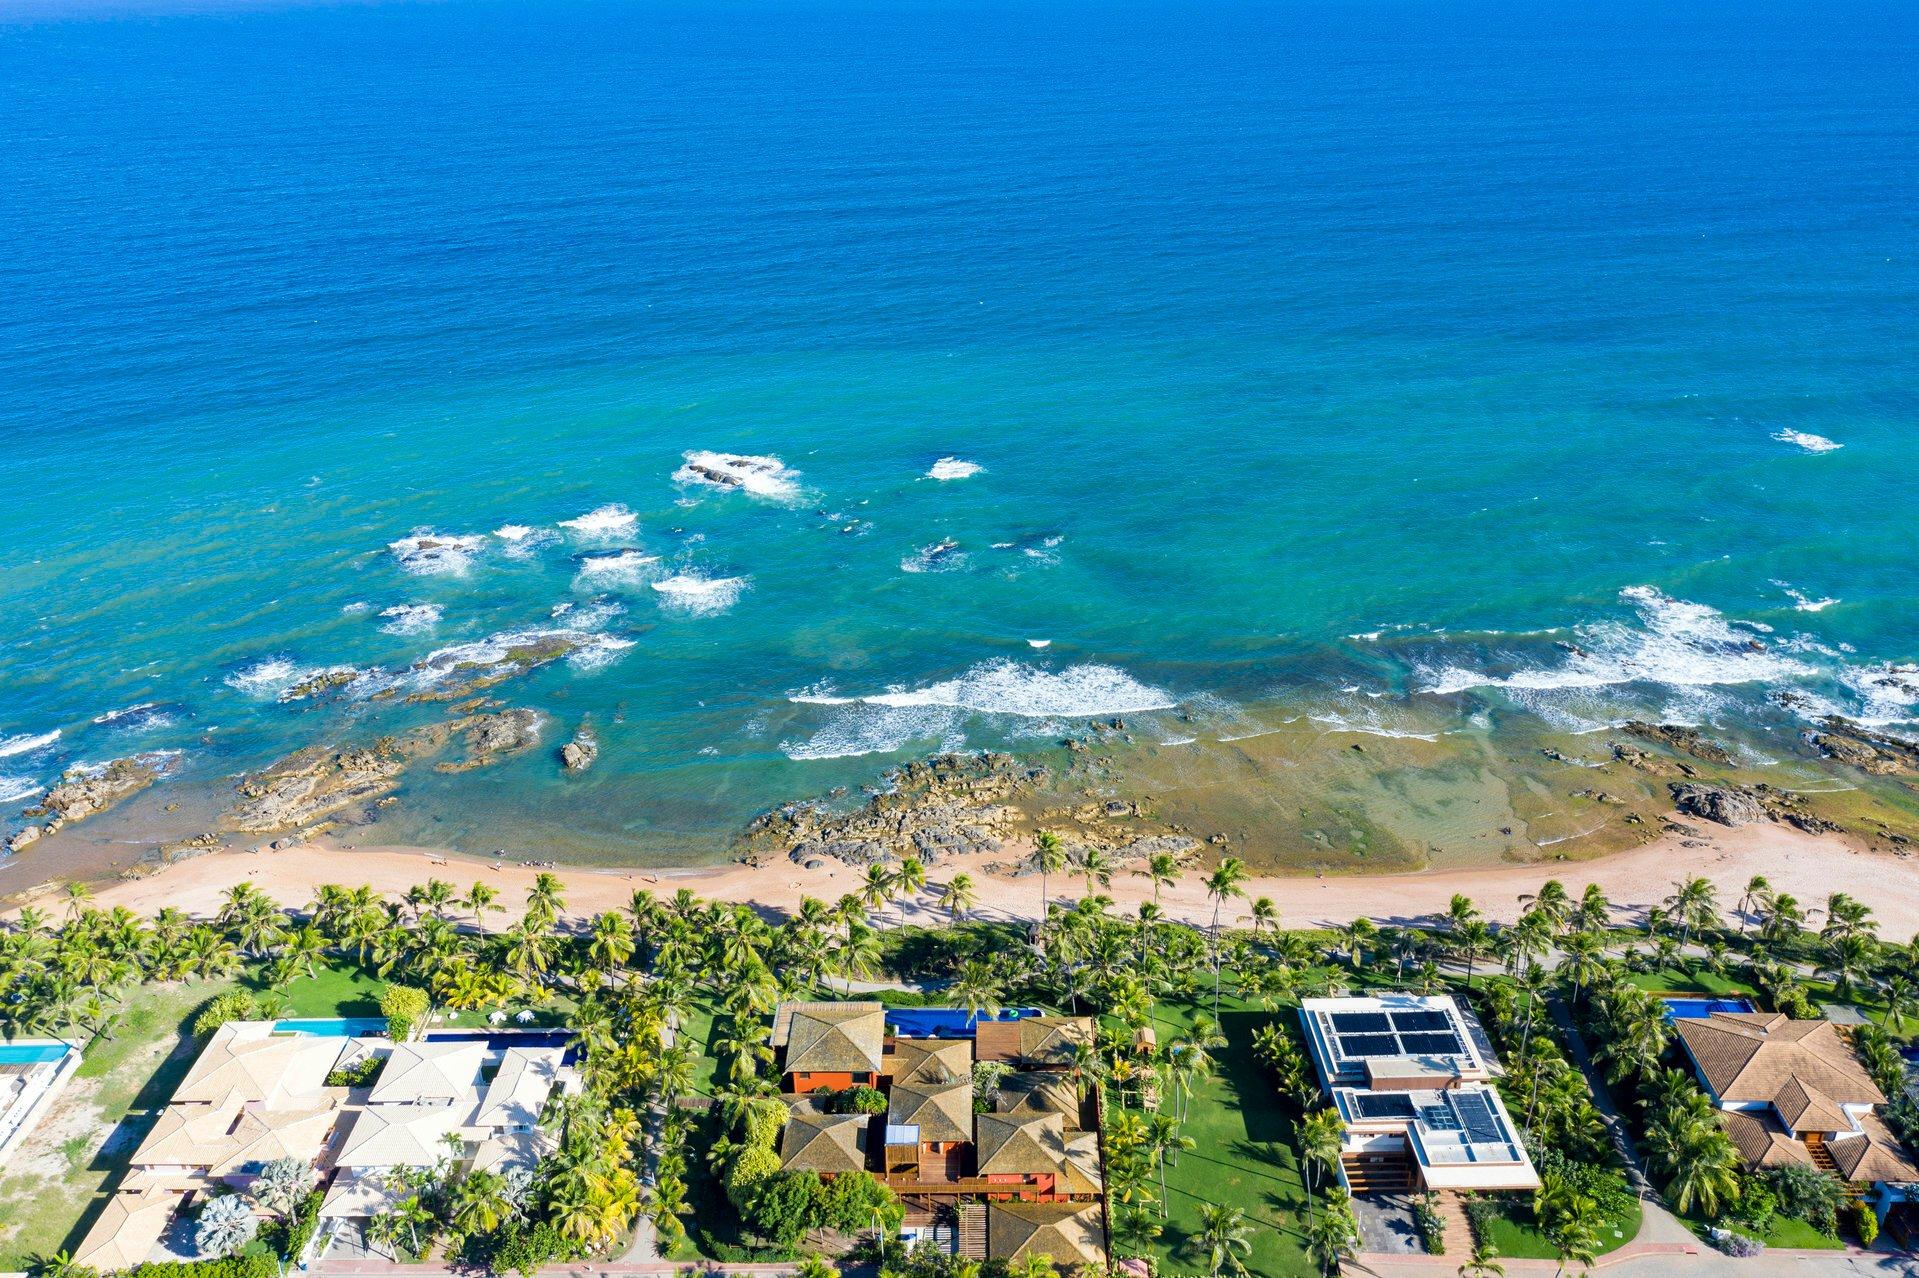 Apartment in Camaçari, State of Bahia, Brazil 1